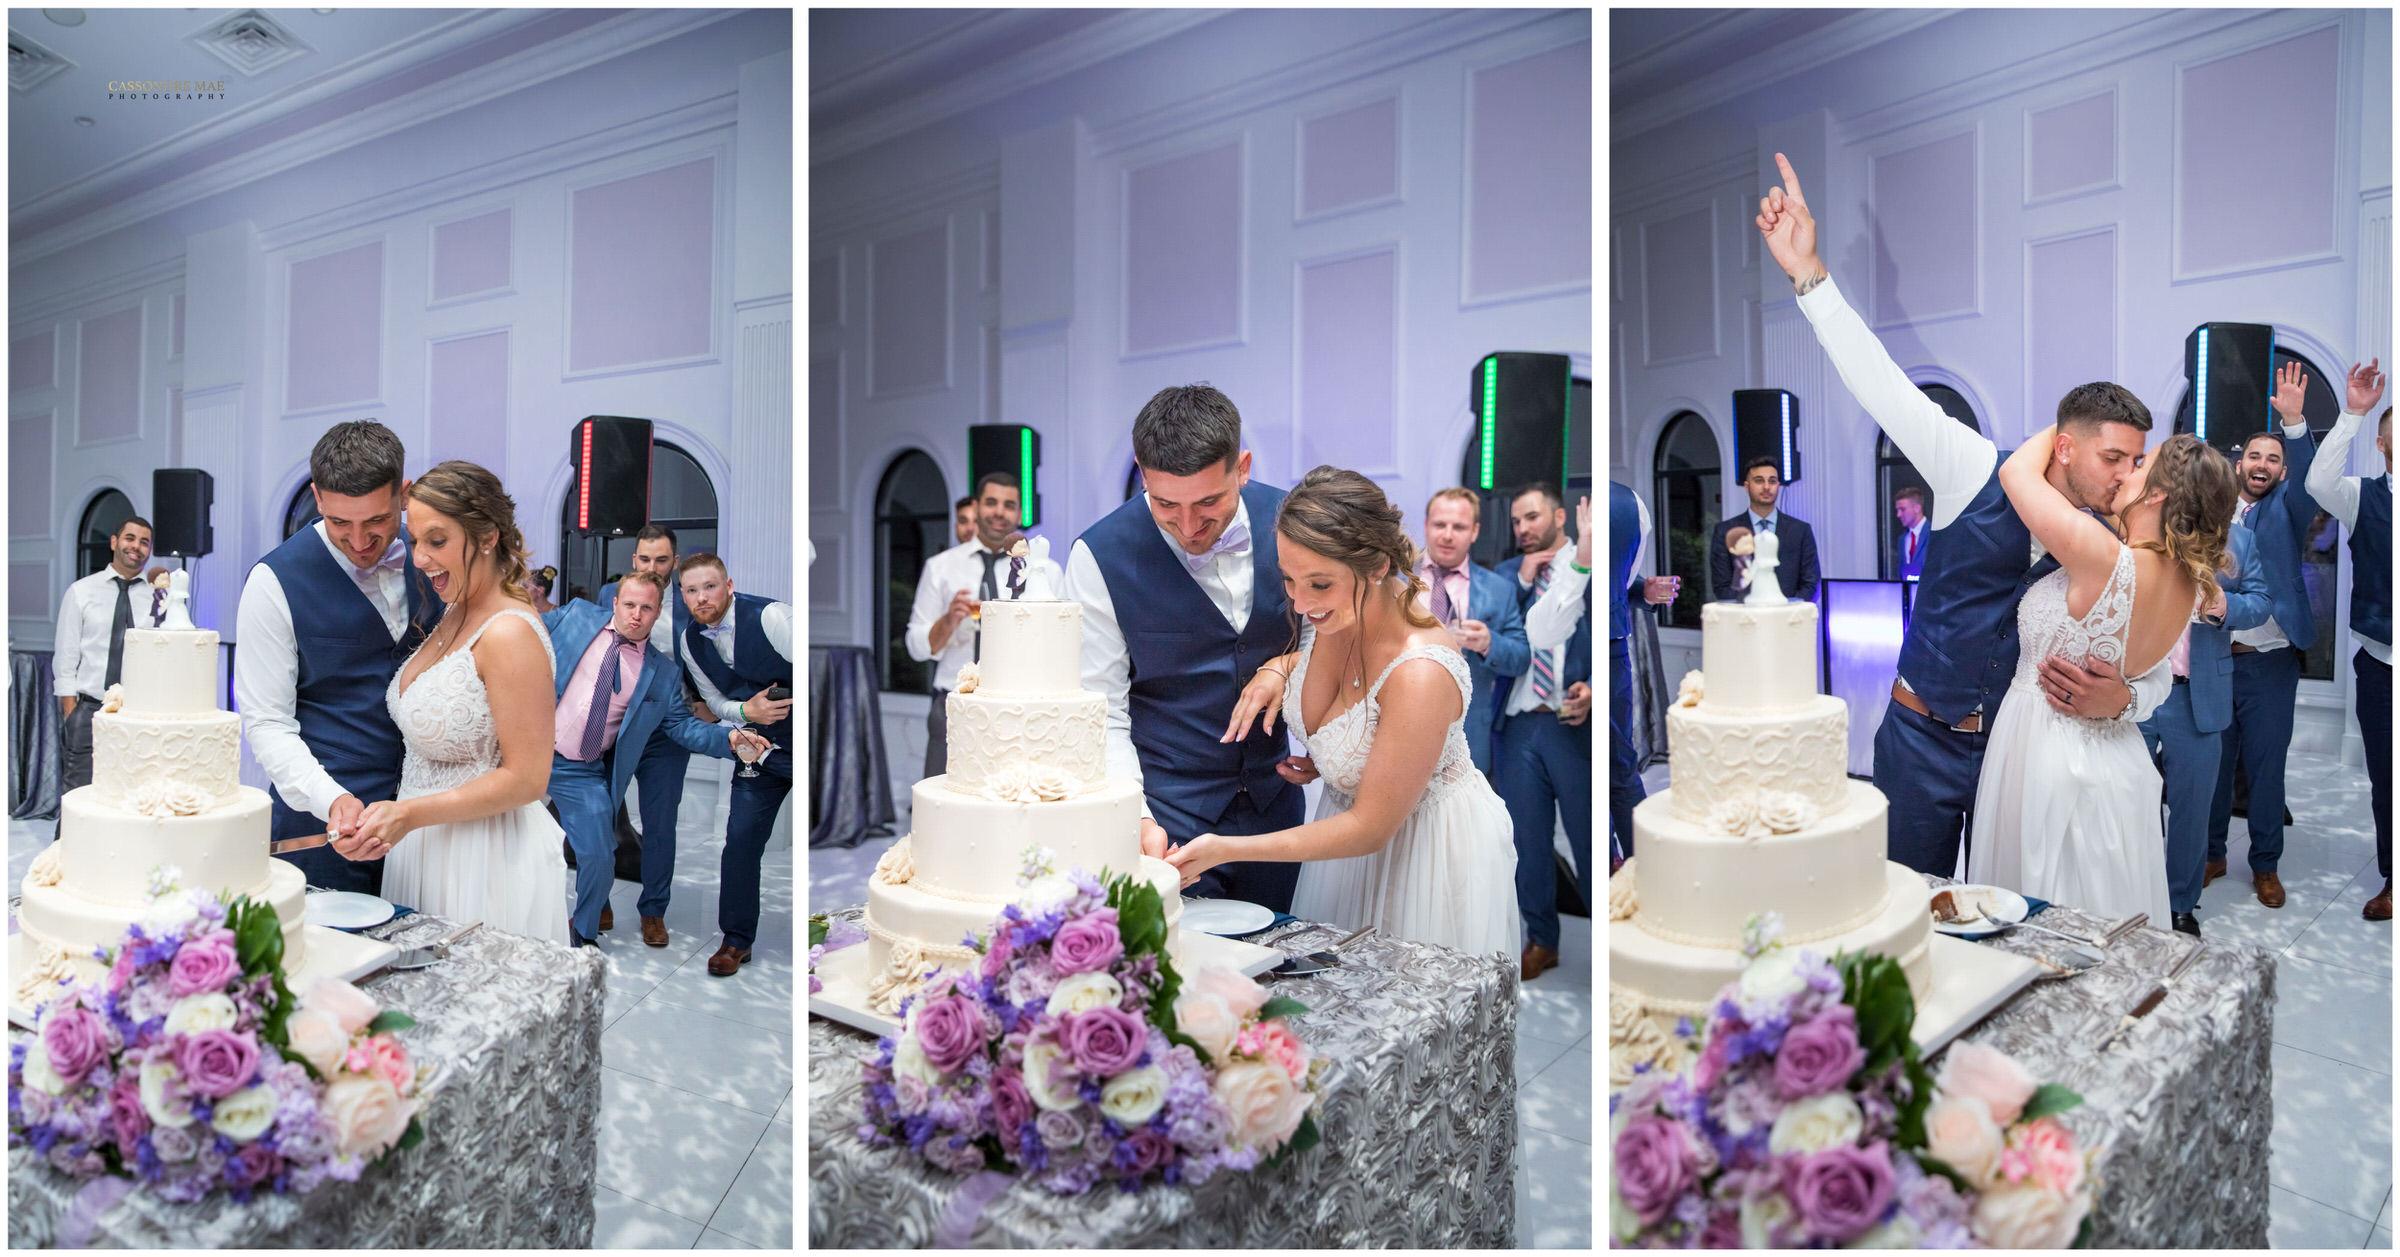 Cassondre Mae Photography Villa Venezia Wedding Photographer 45.jpg